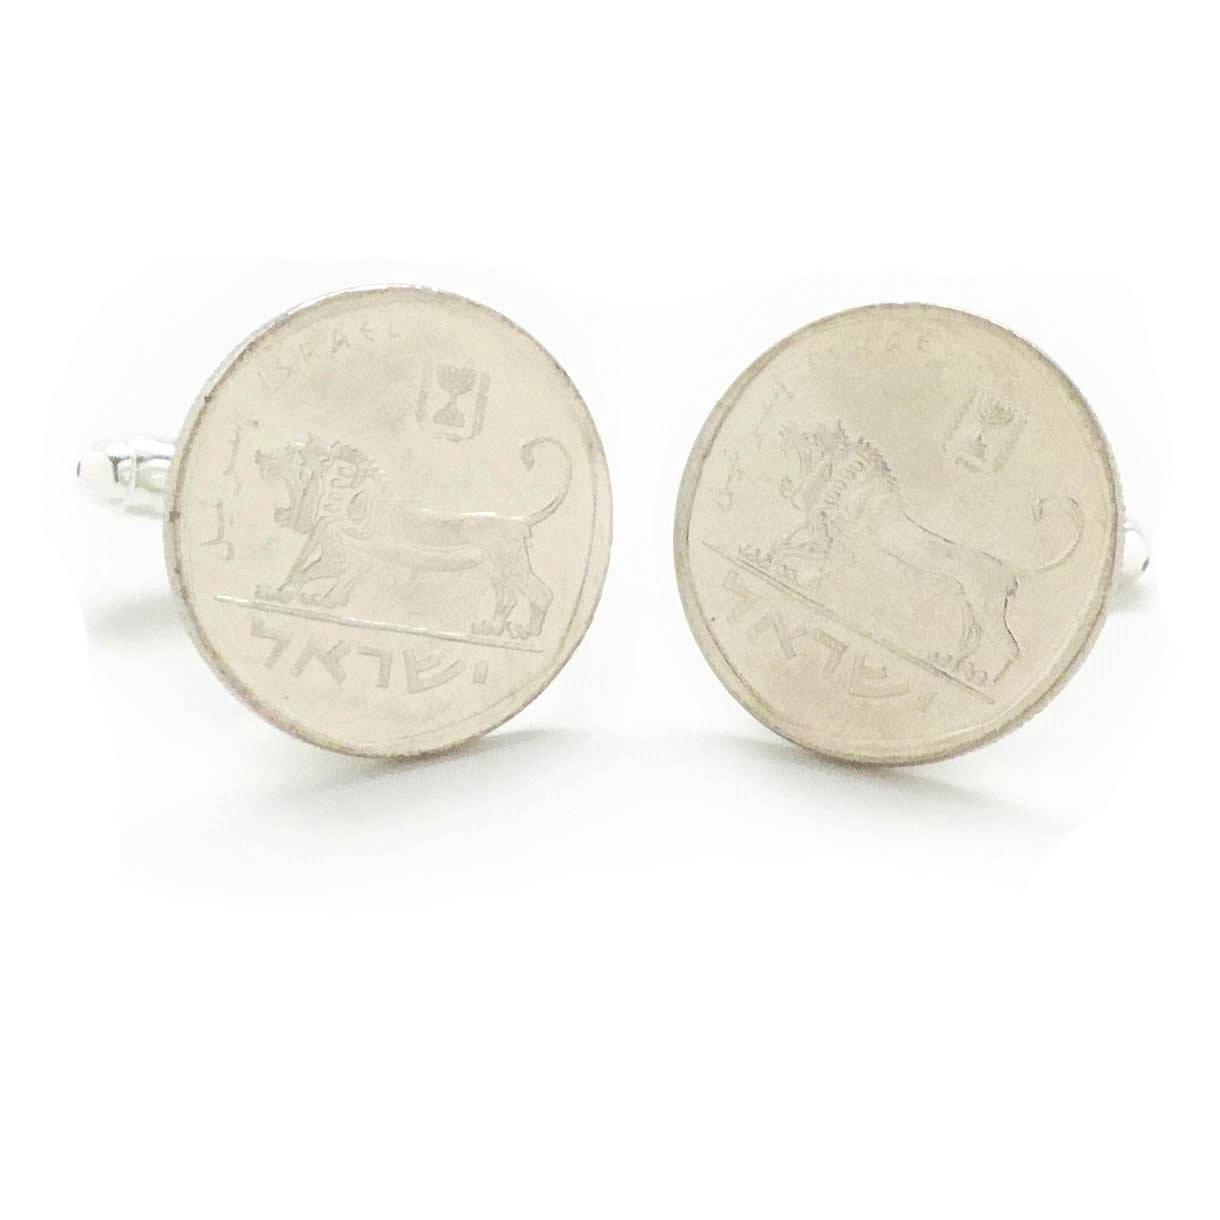 Israel Coin Cufflinks Cuff Links Israelite Israeli Jerusalem Jew Jewish Hanukkah Hebrew Biblical Bible